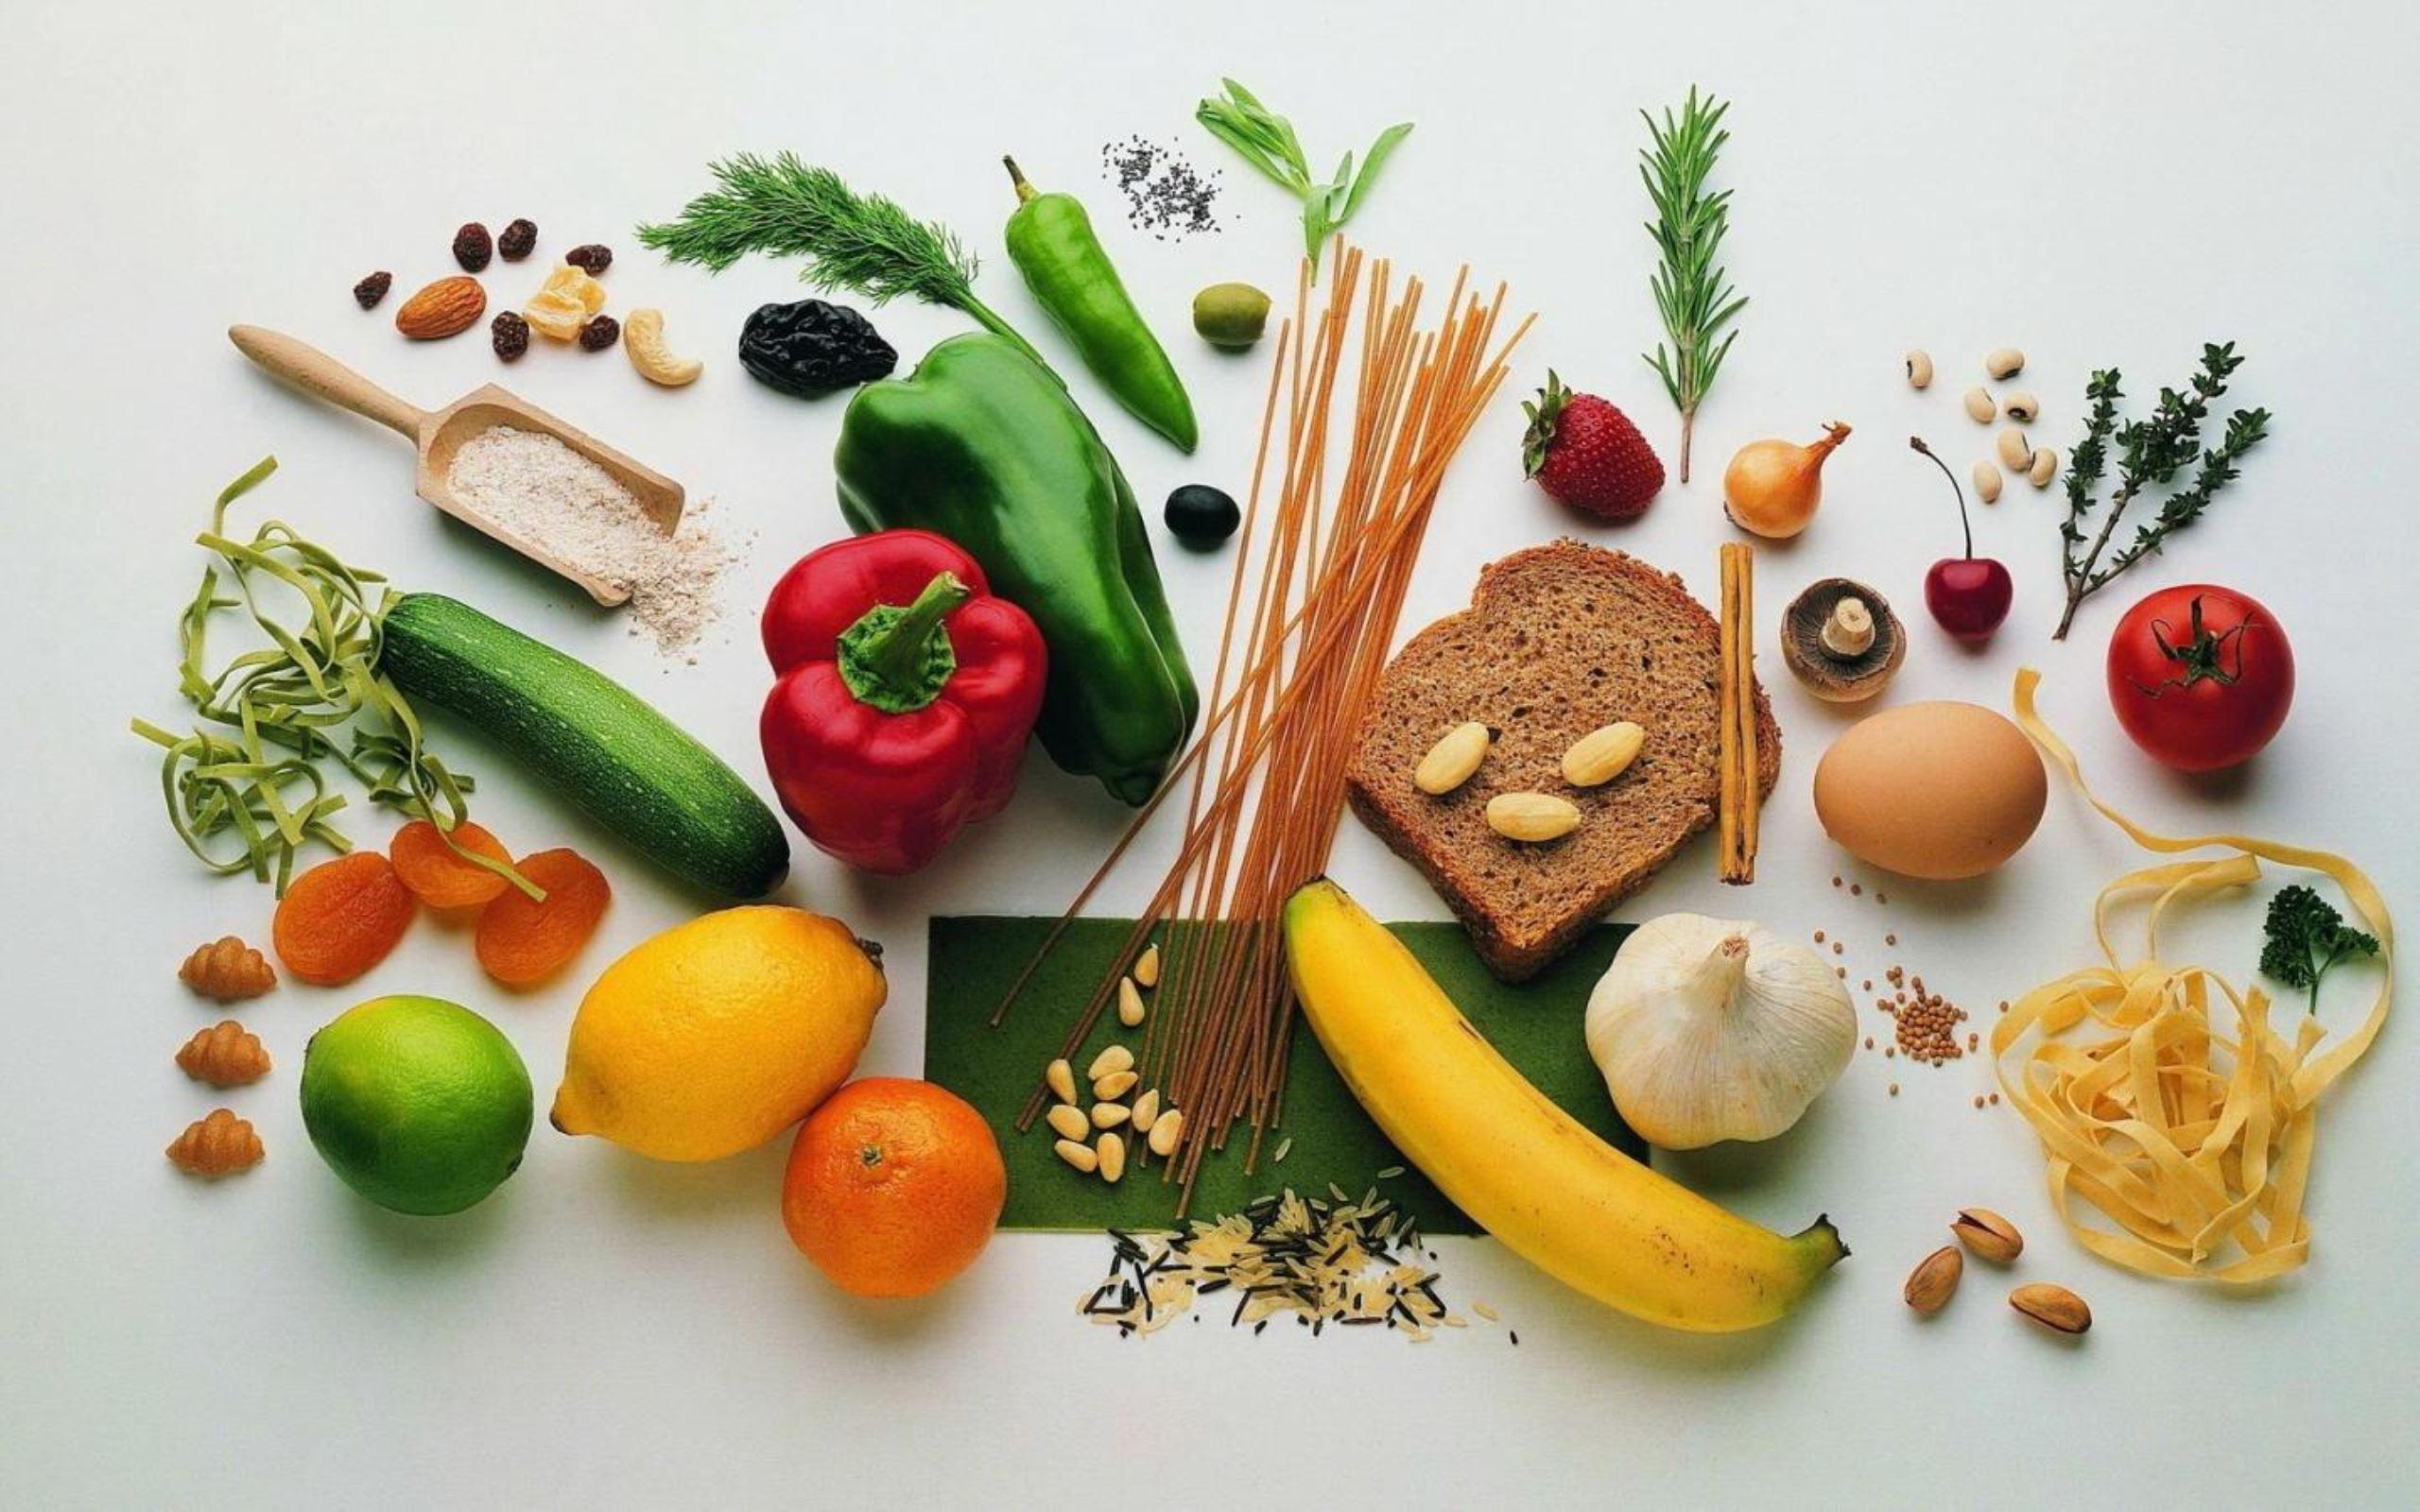 Healthy-Food-Fruits-Vegetables-Wallpaper